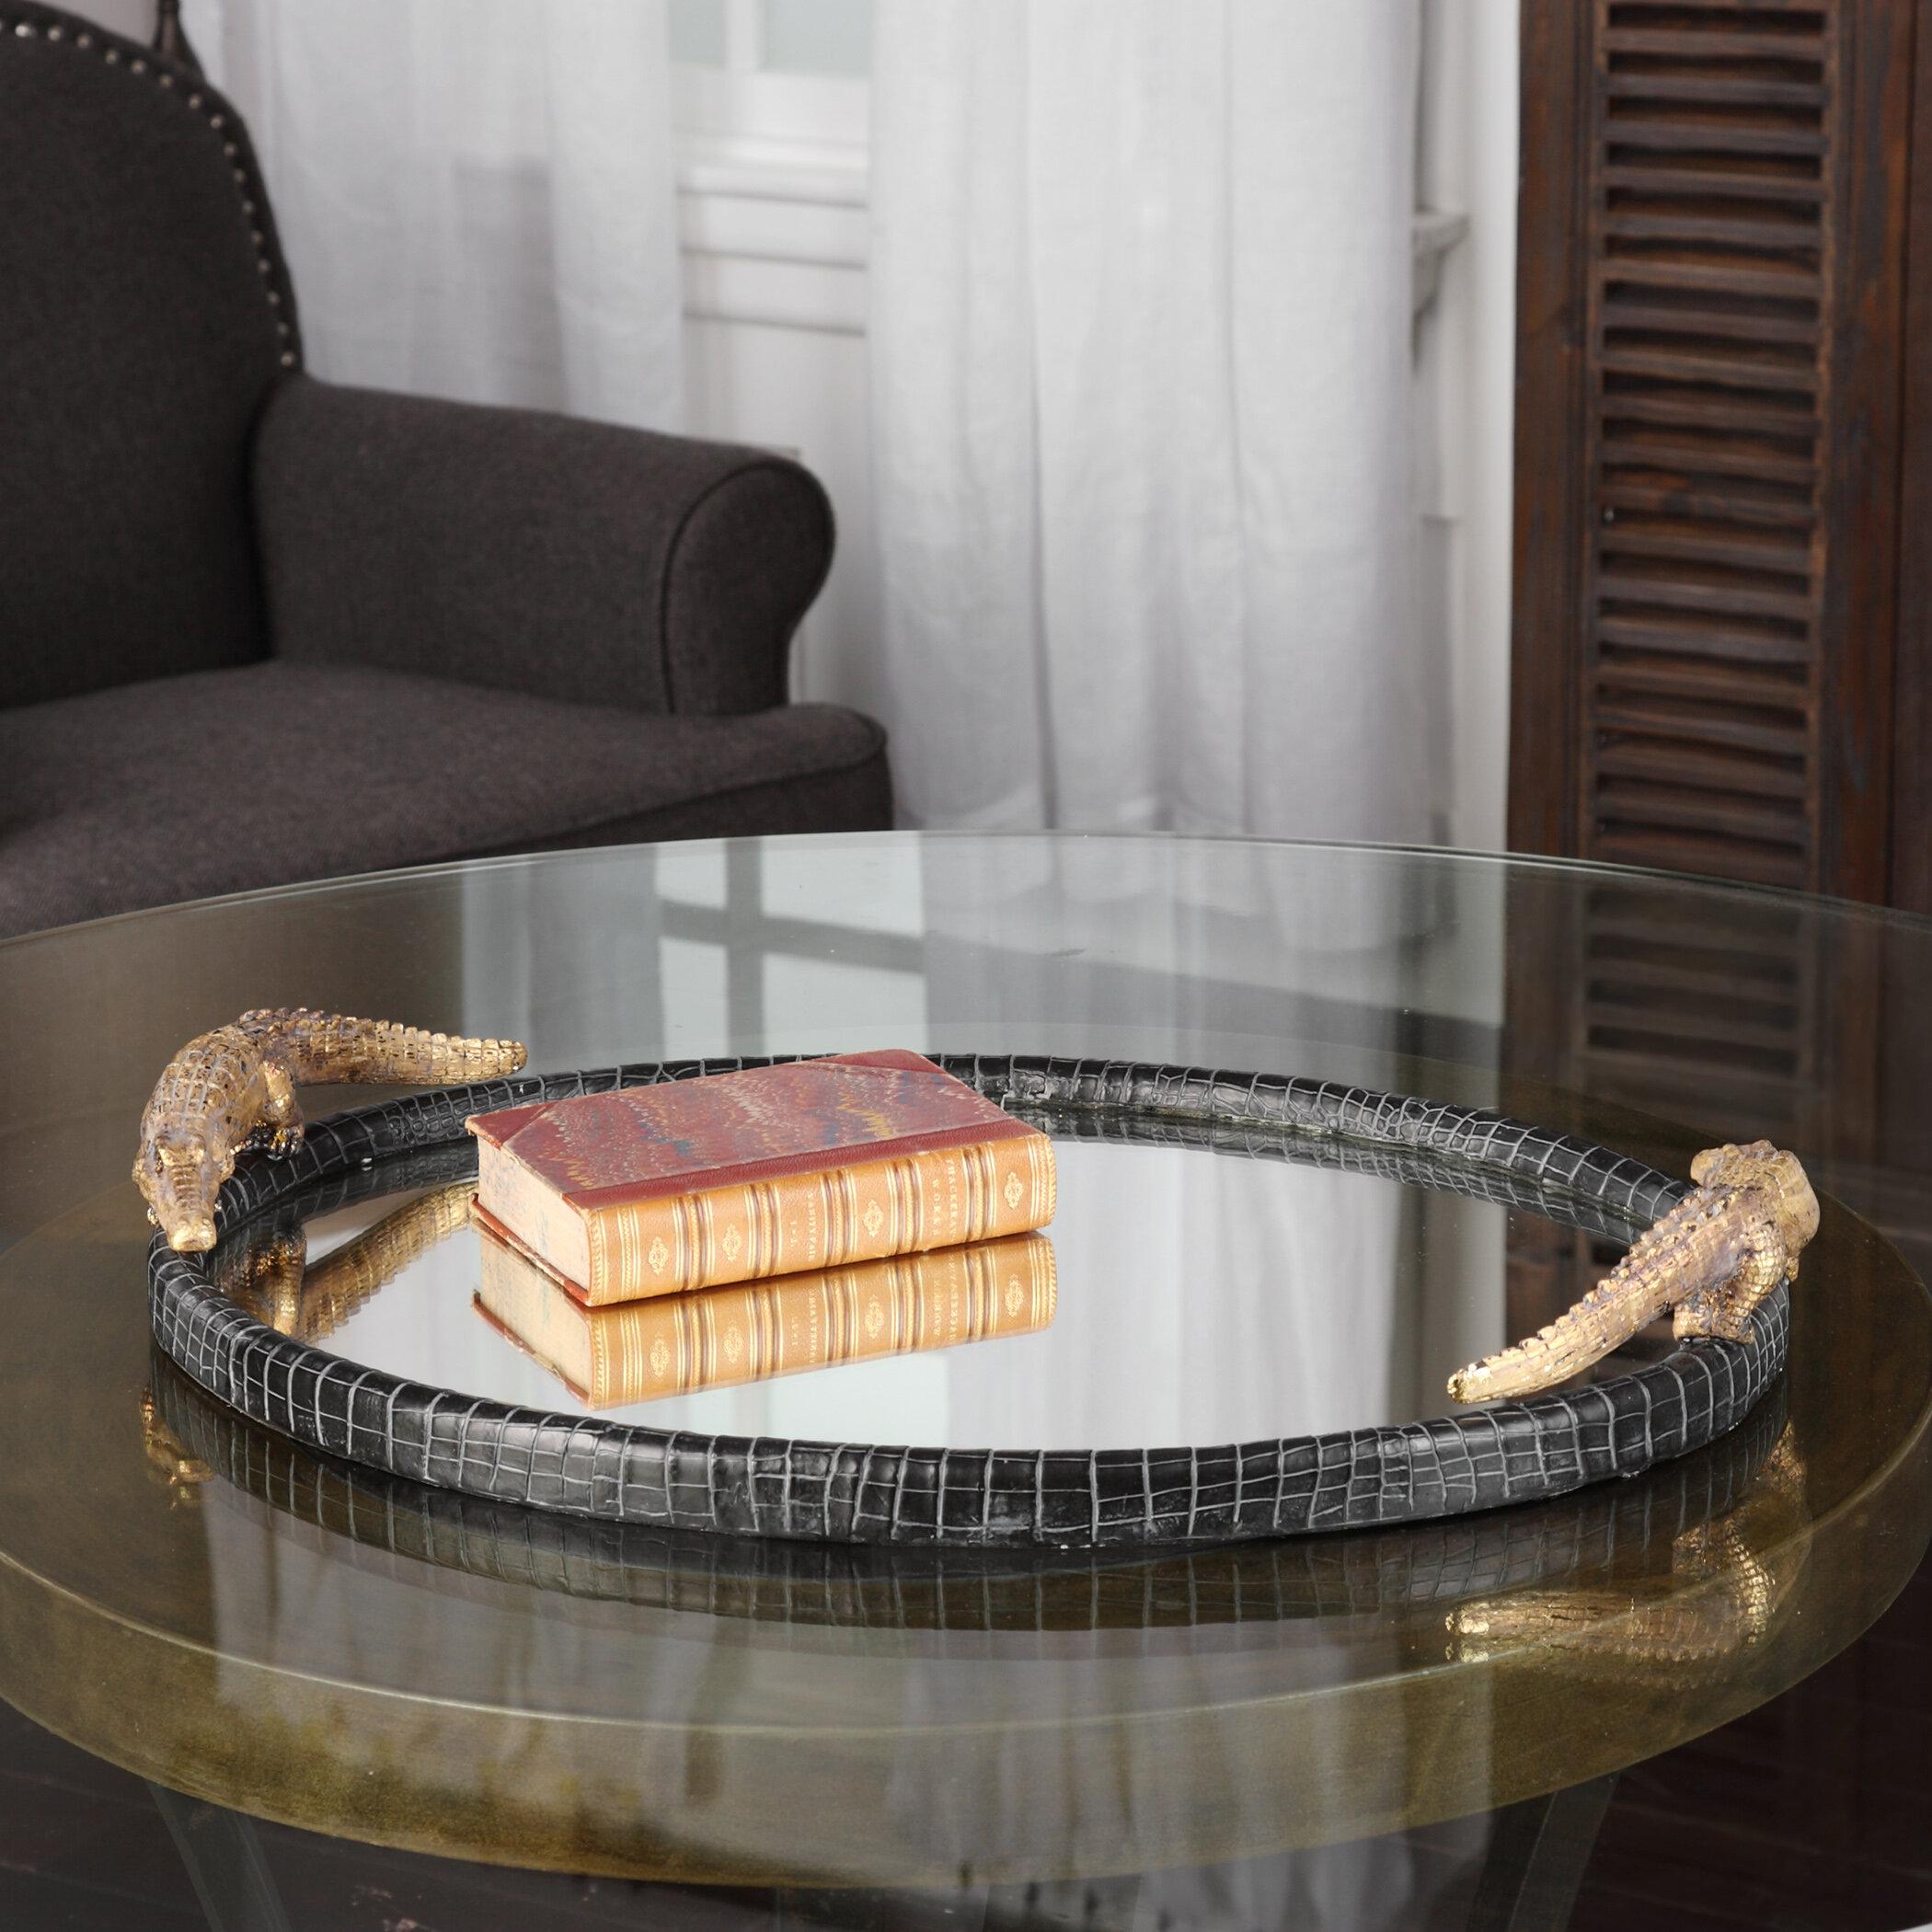 Willa Arlo Interiors Oval Alligator Mirrored Tray & Reviews